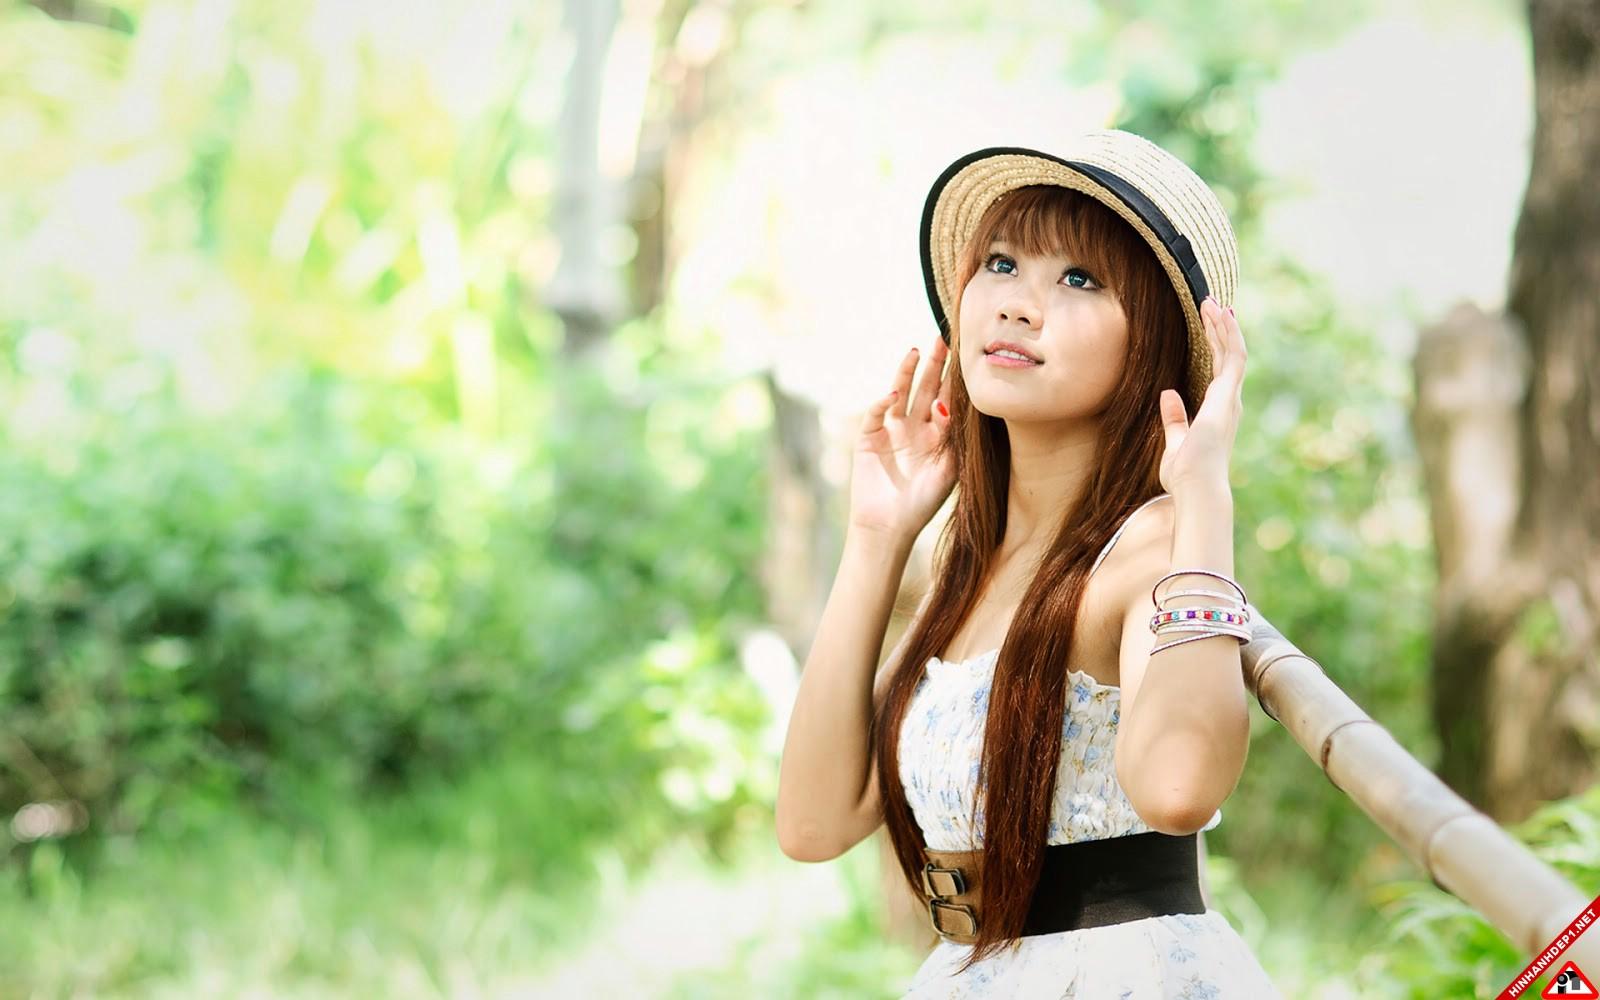 bo-anh-girl-xinh-cung-huong-dong-gio-noi (8)